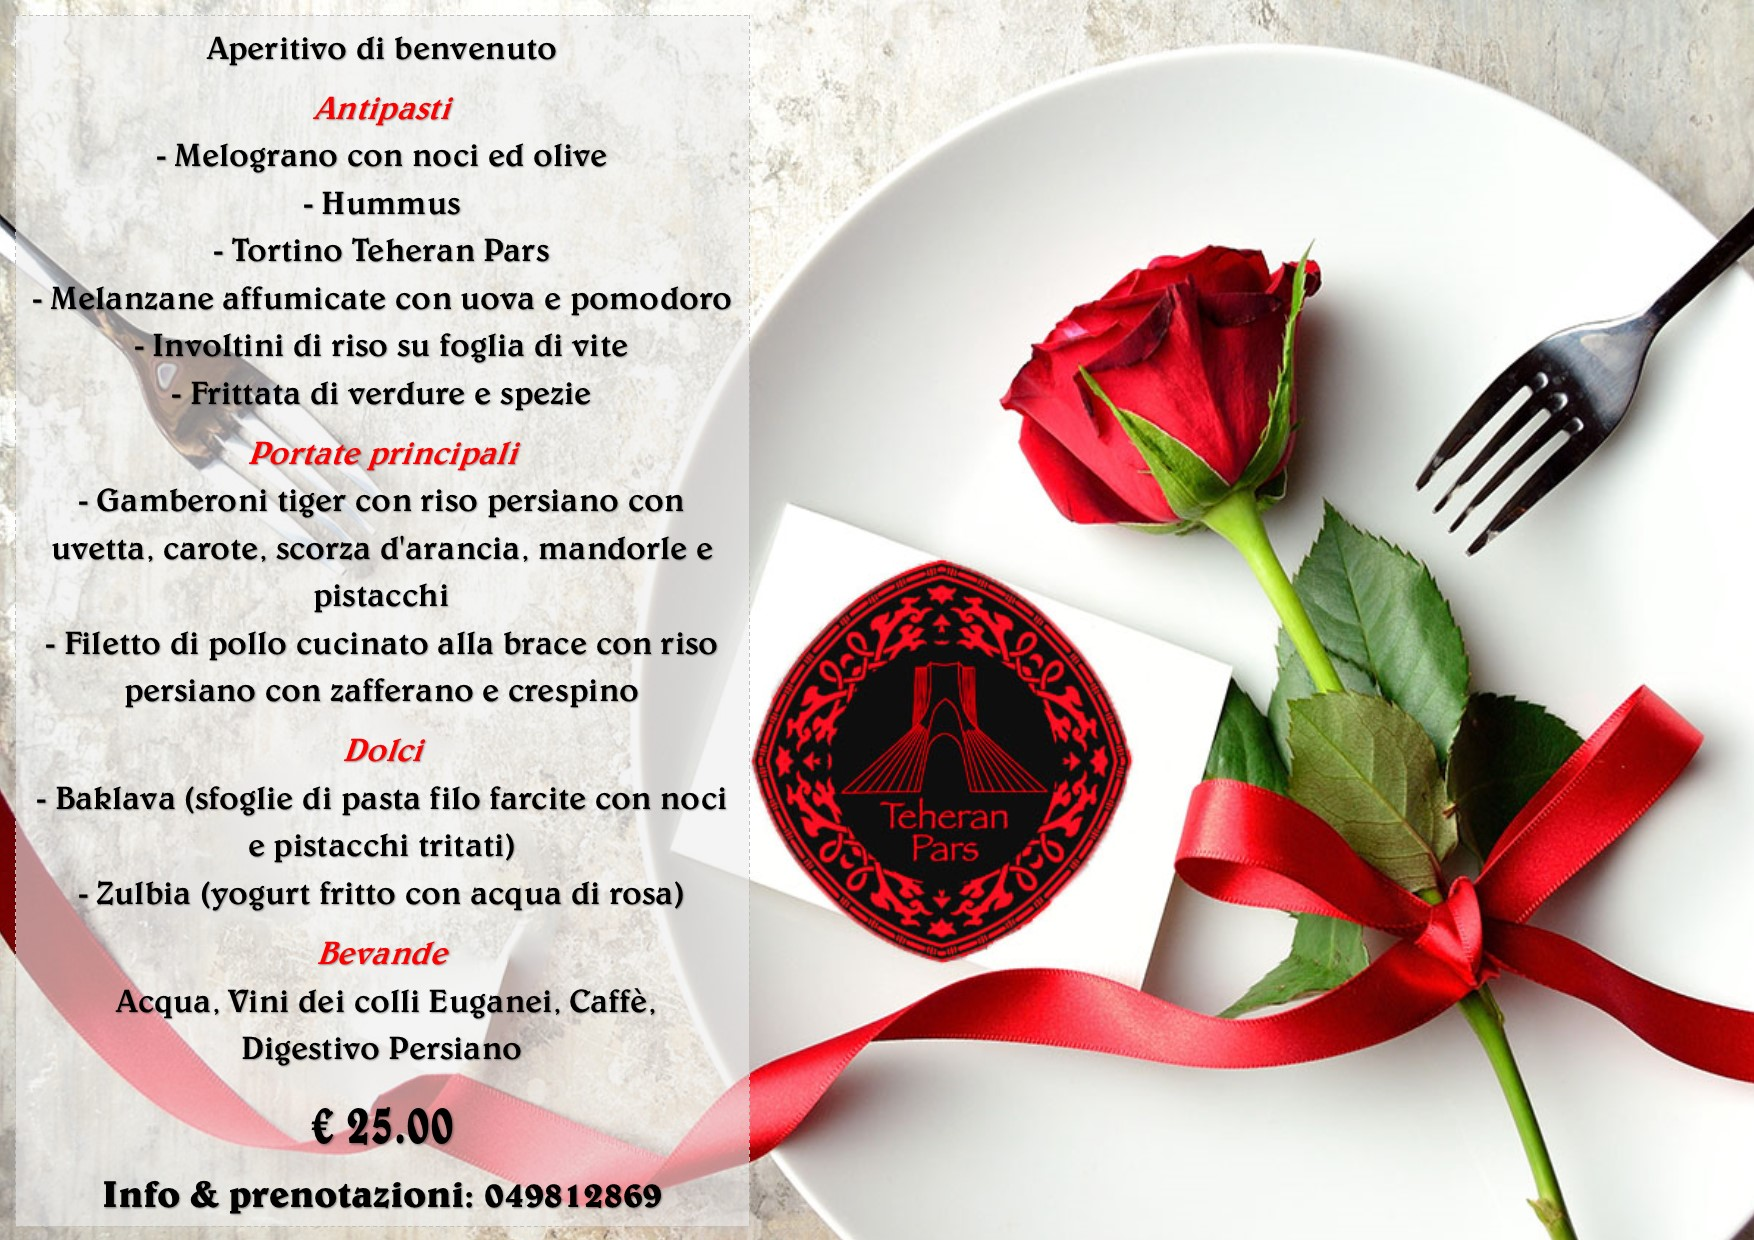 Teheran Pars menu di San Valentino 2018